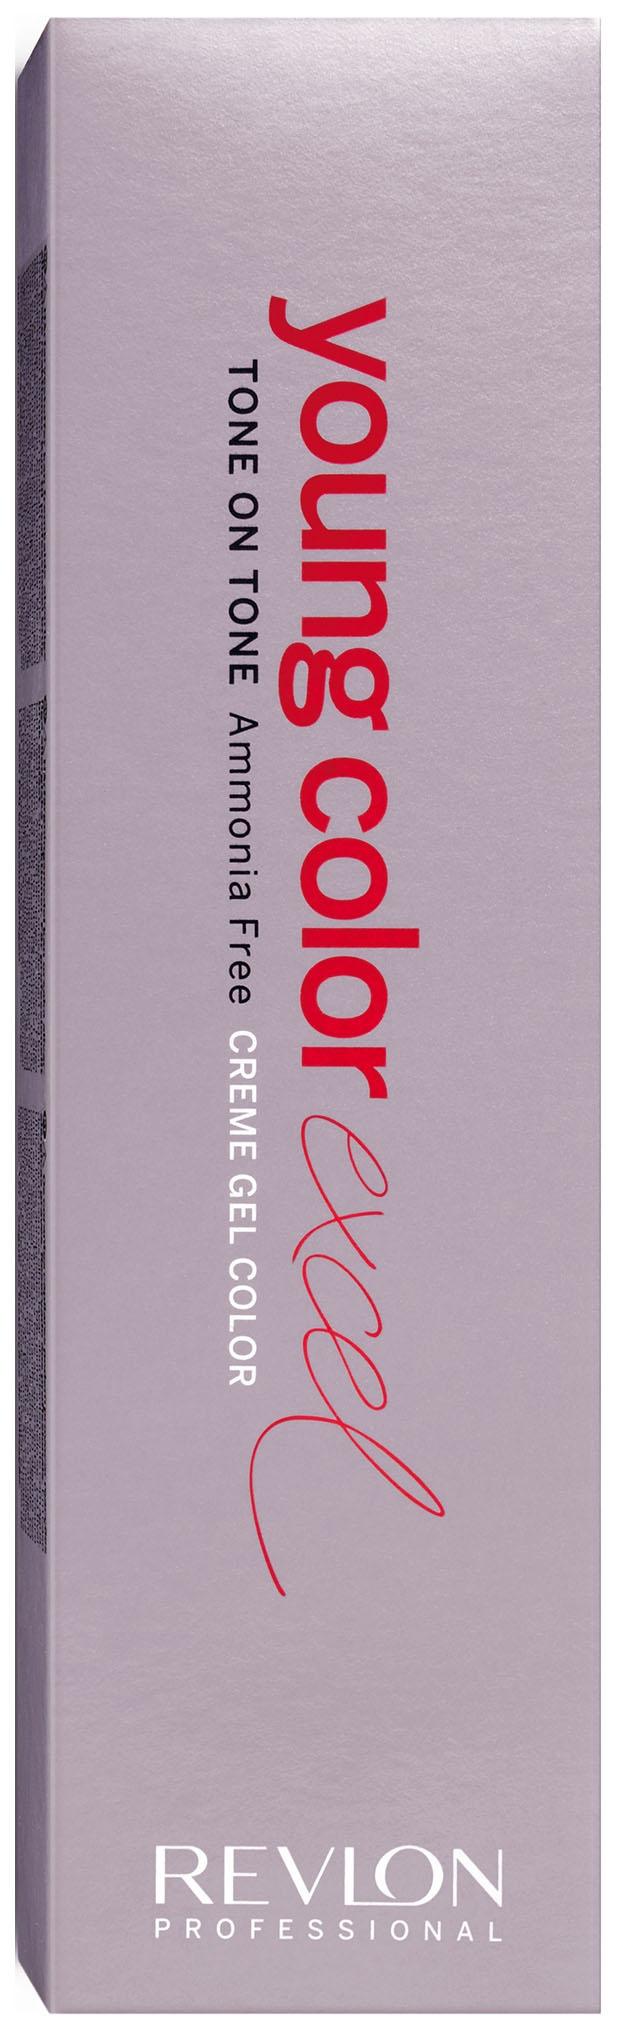 Краска для волос Revlon Professional YCE 4-65 Глубокий красный 70 мл